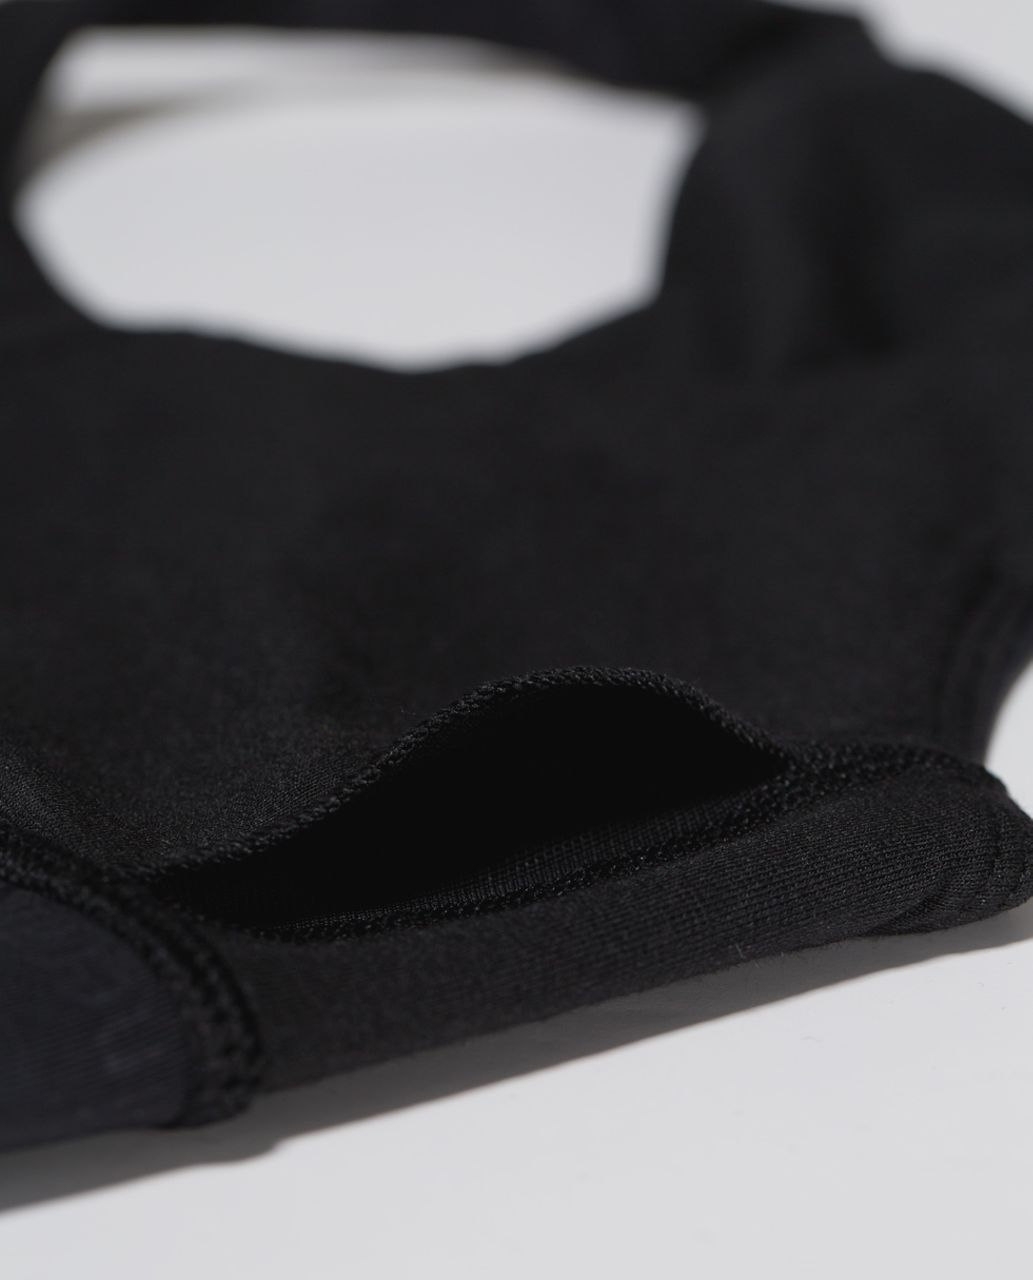 Lululemon 50 Rep Bra - Classic Manifesto Embossed Black / Black